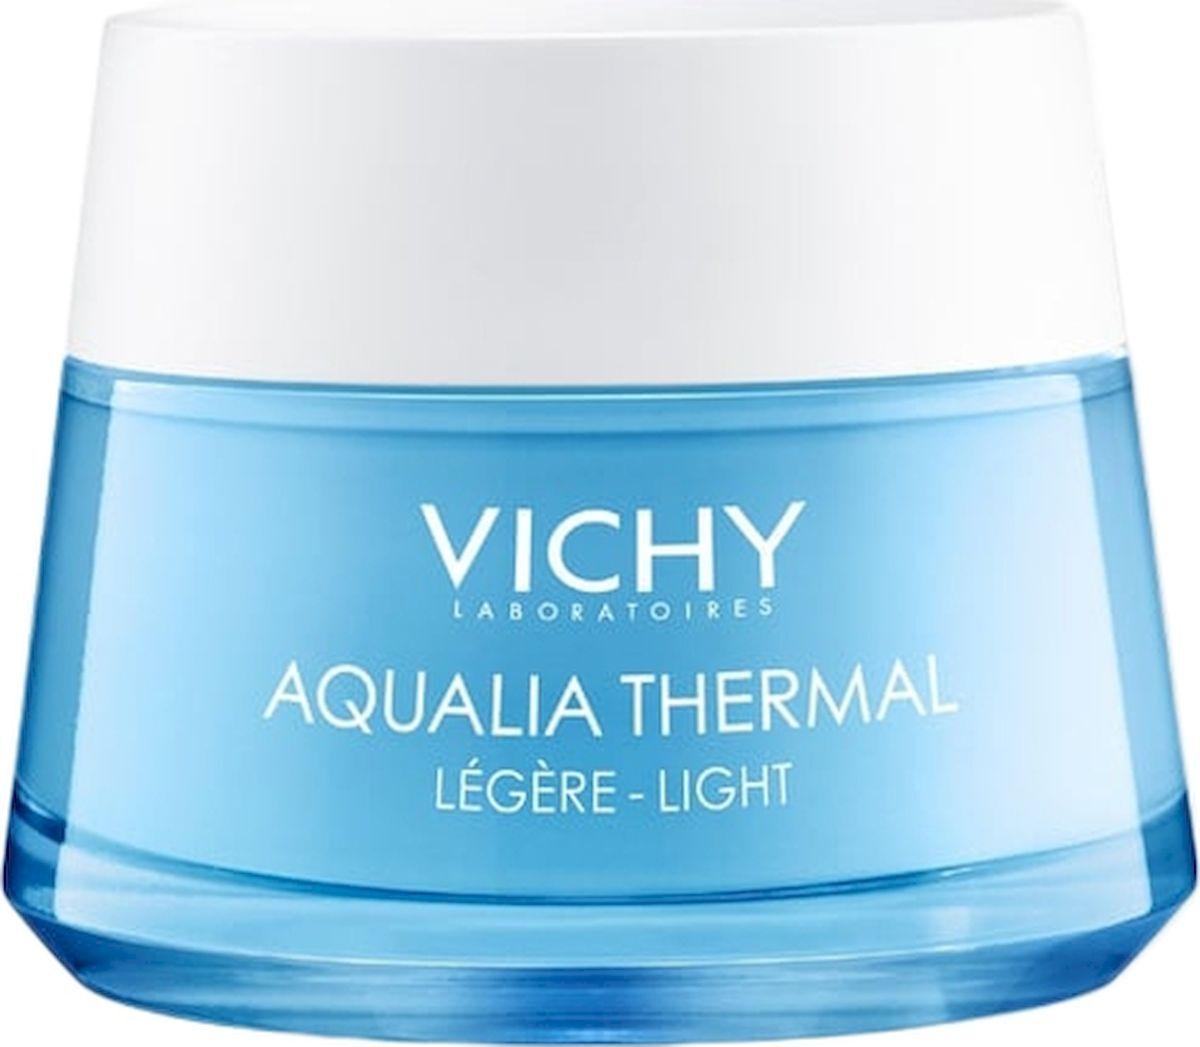 Крем для лица Vichy Aqualia Thermal, легкий, 50 мл VICHY